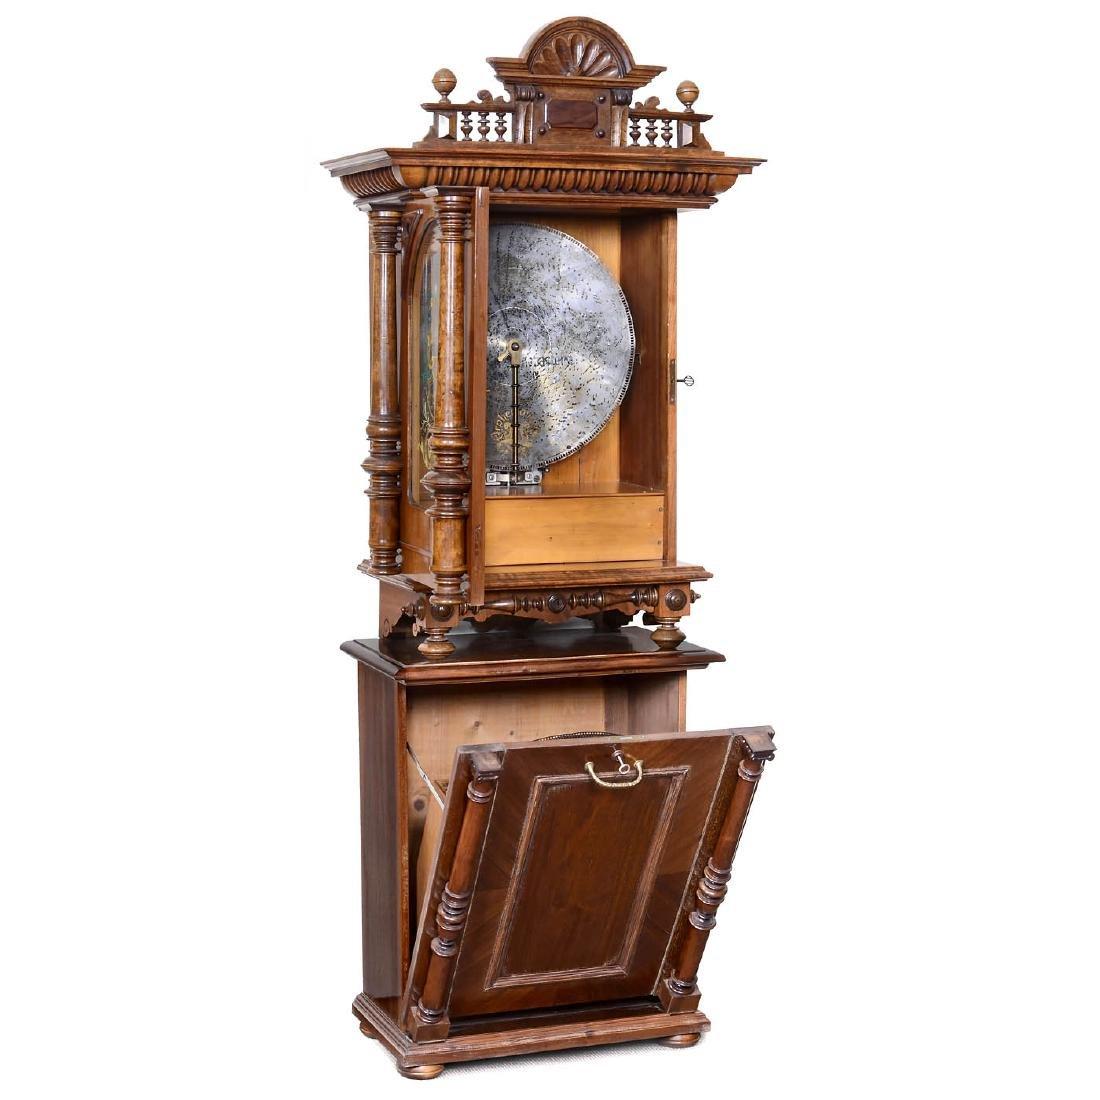 Orphenion No. 118 Musical Cabinet, c. 1896 - 2